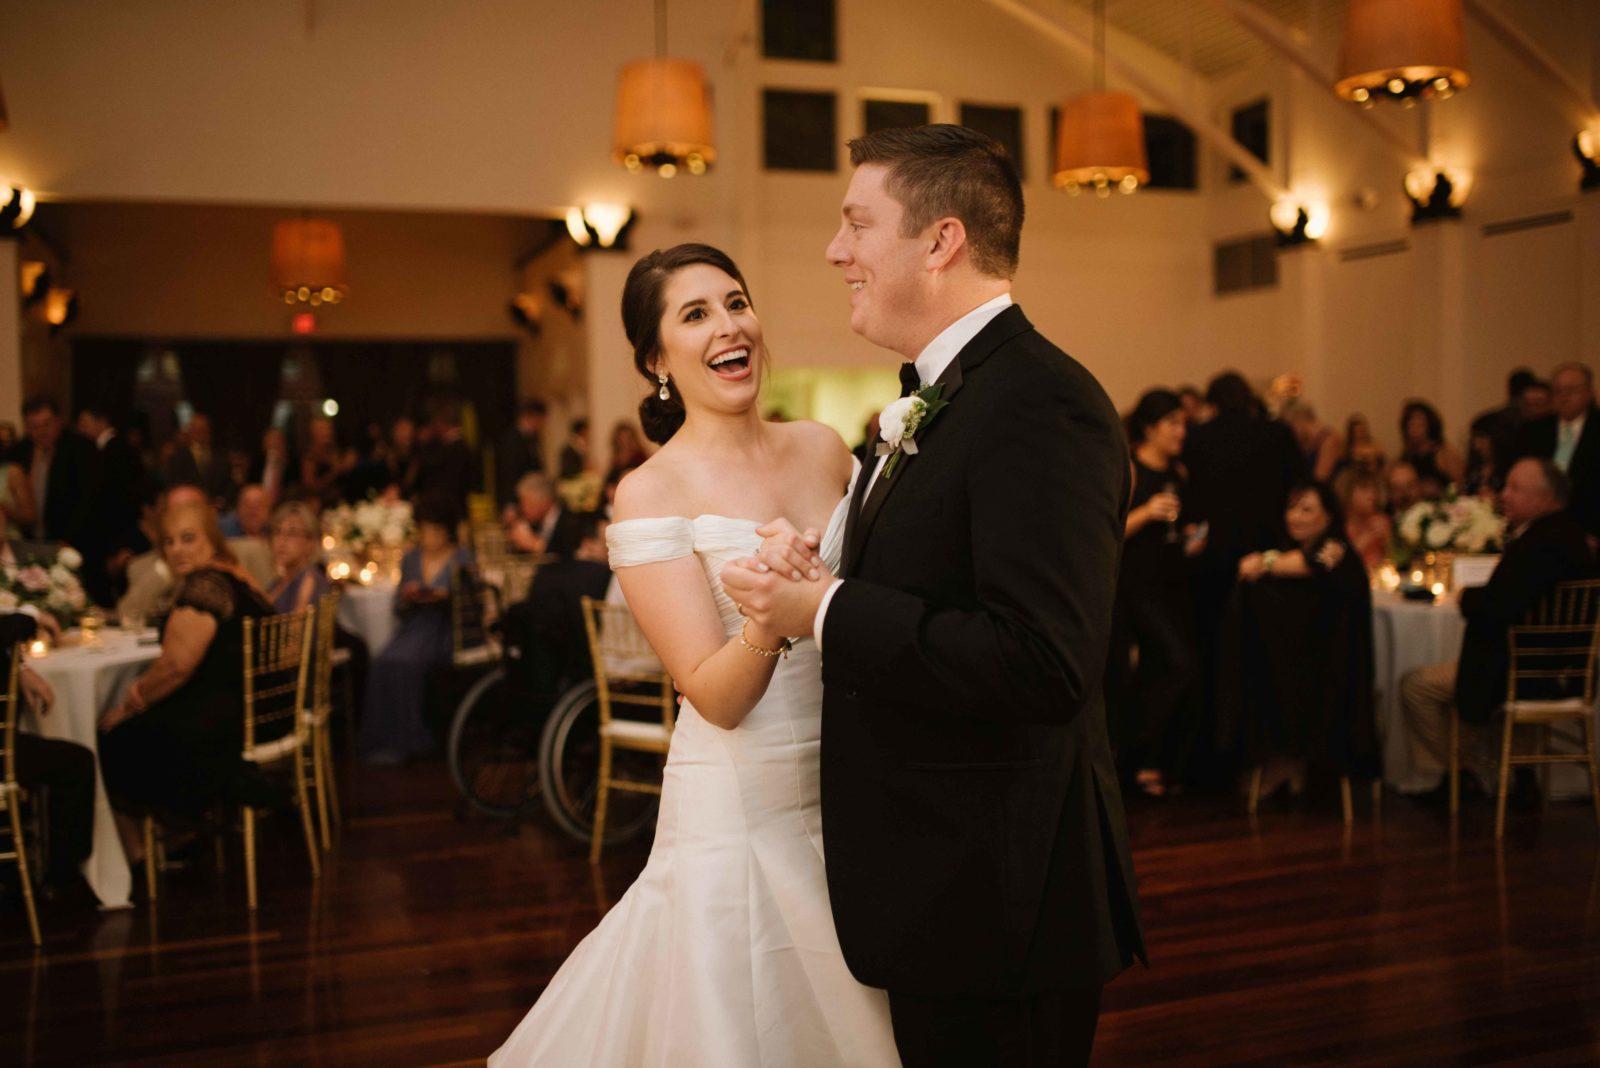 A newlywed couple dances at their wedding reception at the Audubon Tea Room. Photo: Lauren Carroll Photography